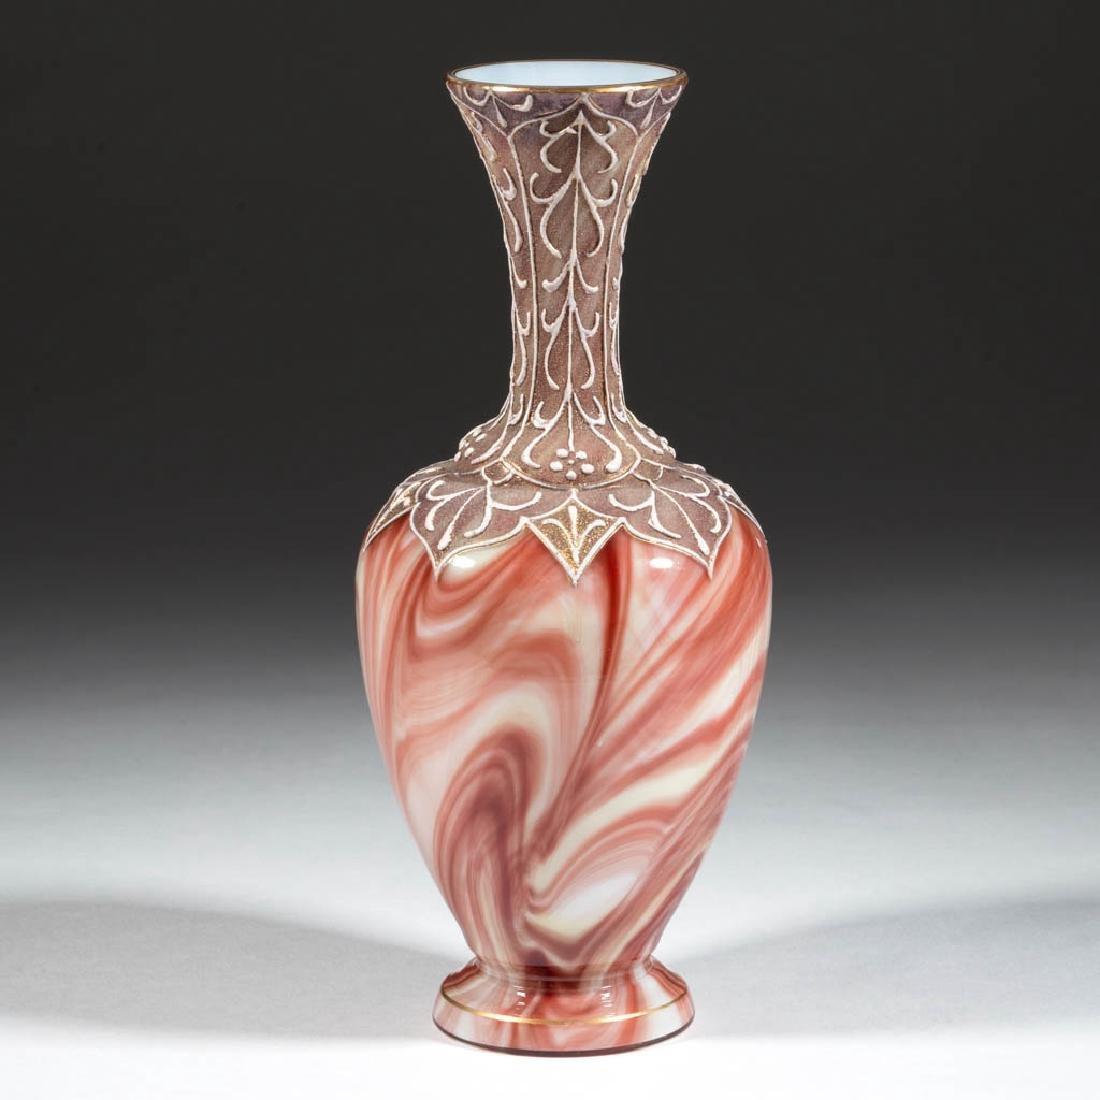 LOETZ ATTRIBUTED ONYX / MARMORIERTES ART GLASS VASE